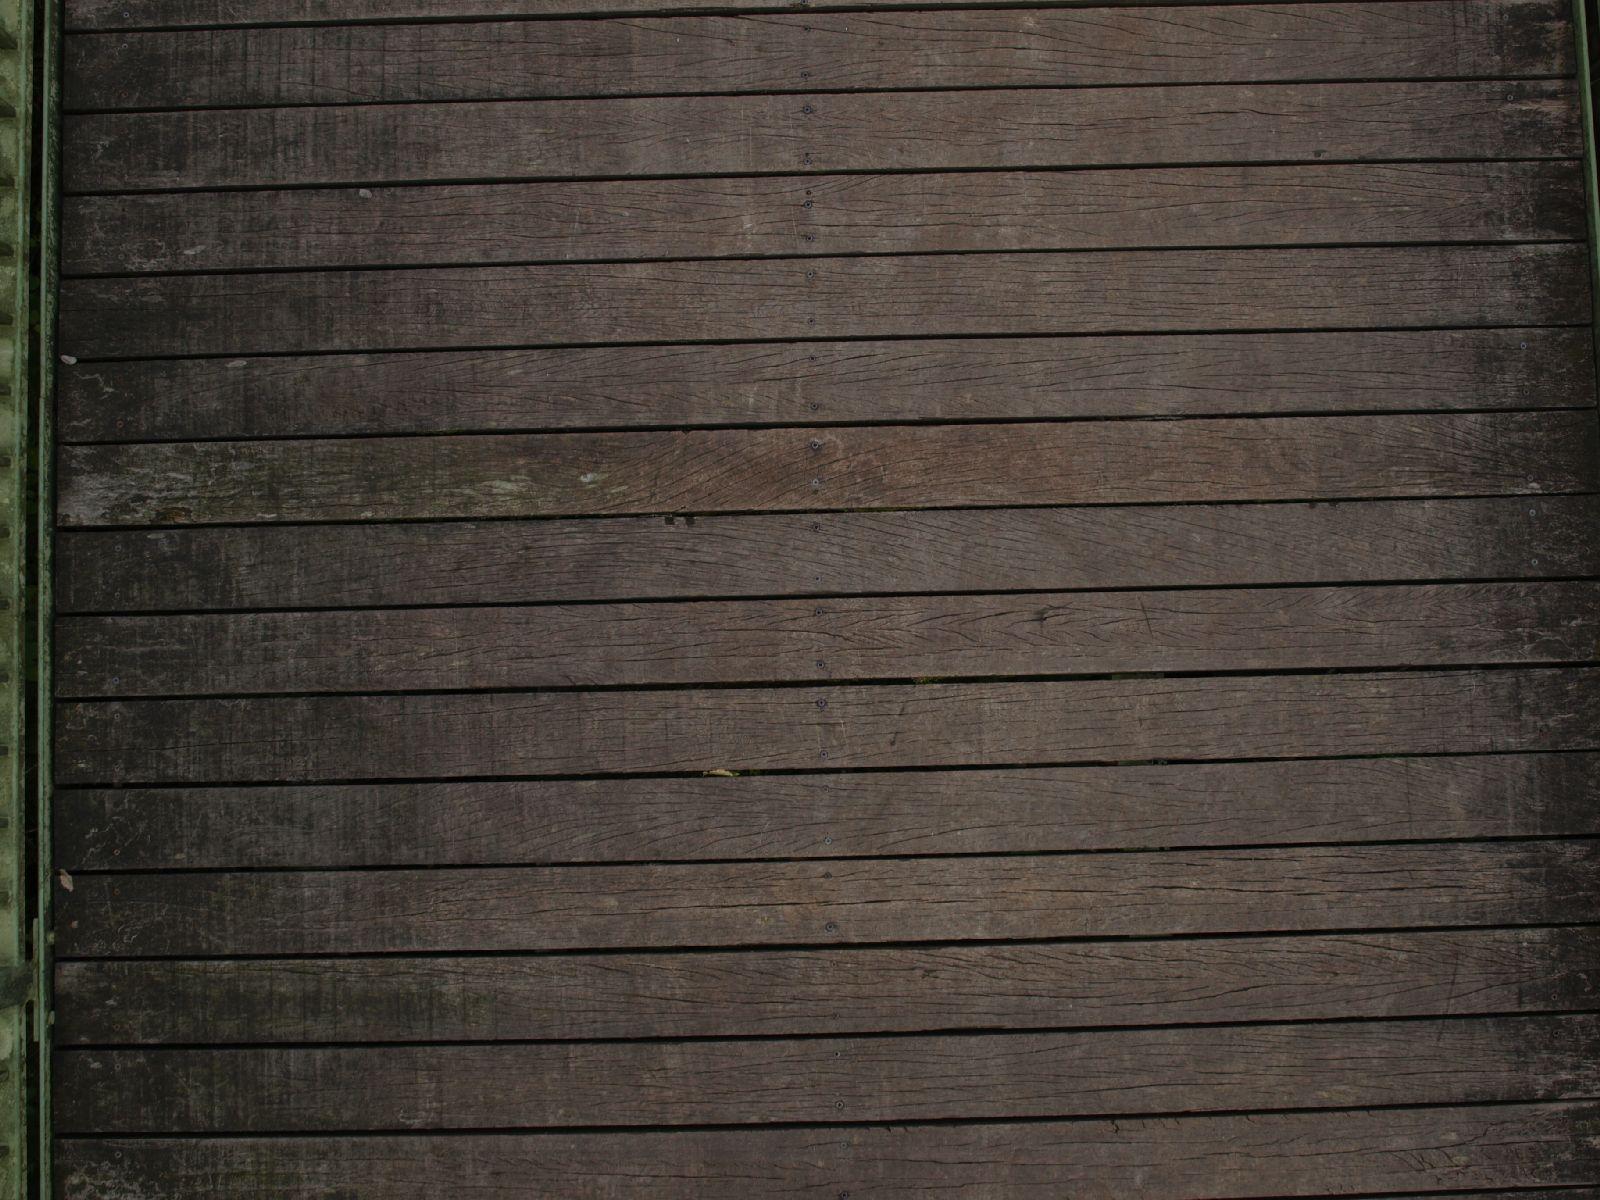 Wood_Texture_A_P8299342